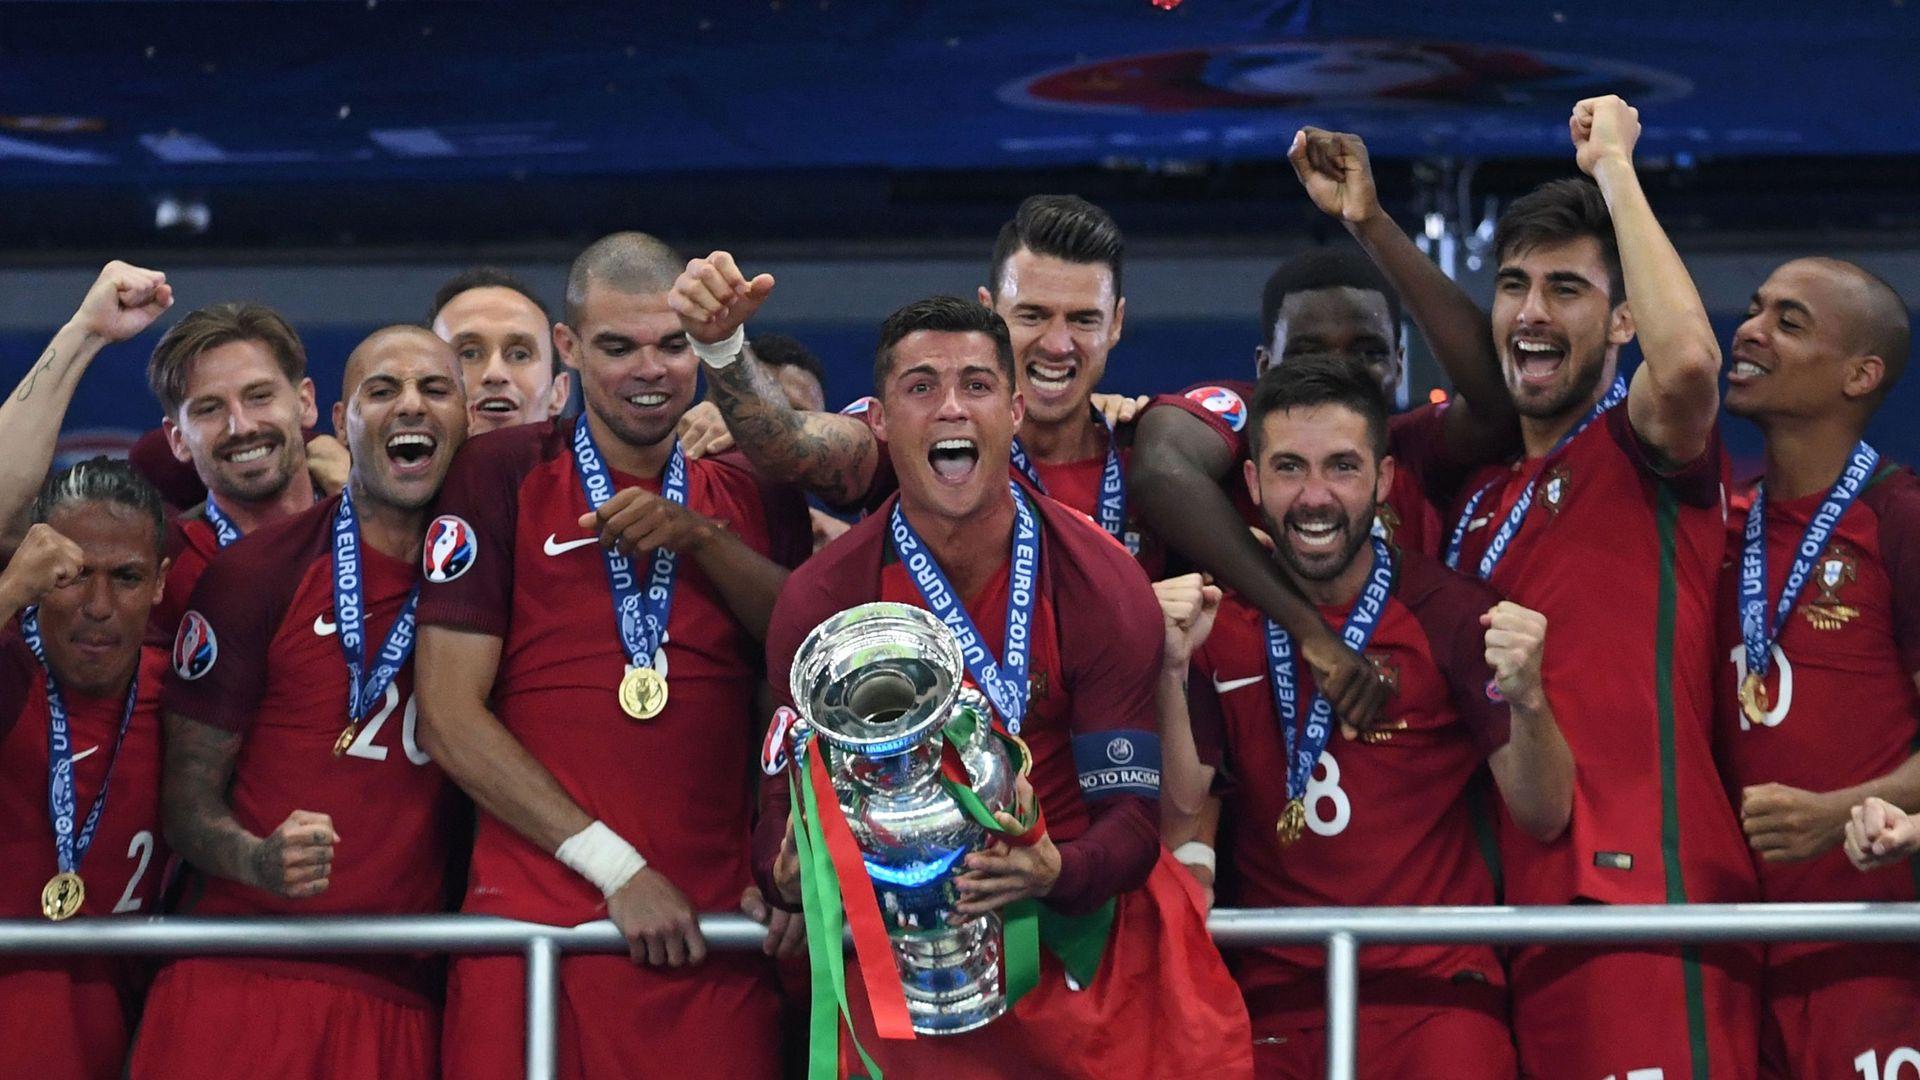 Original 12 cities to host Euro 2020 matches